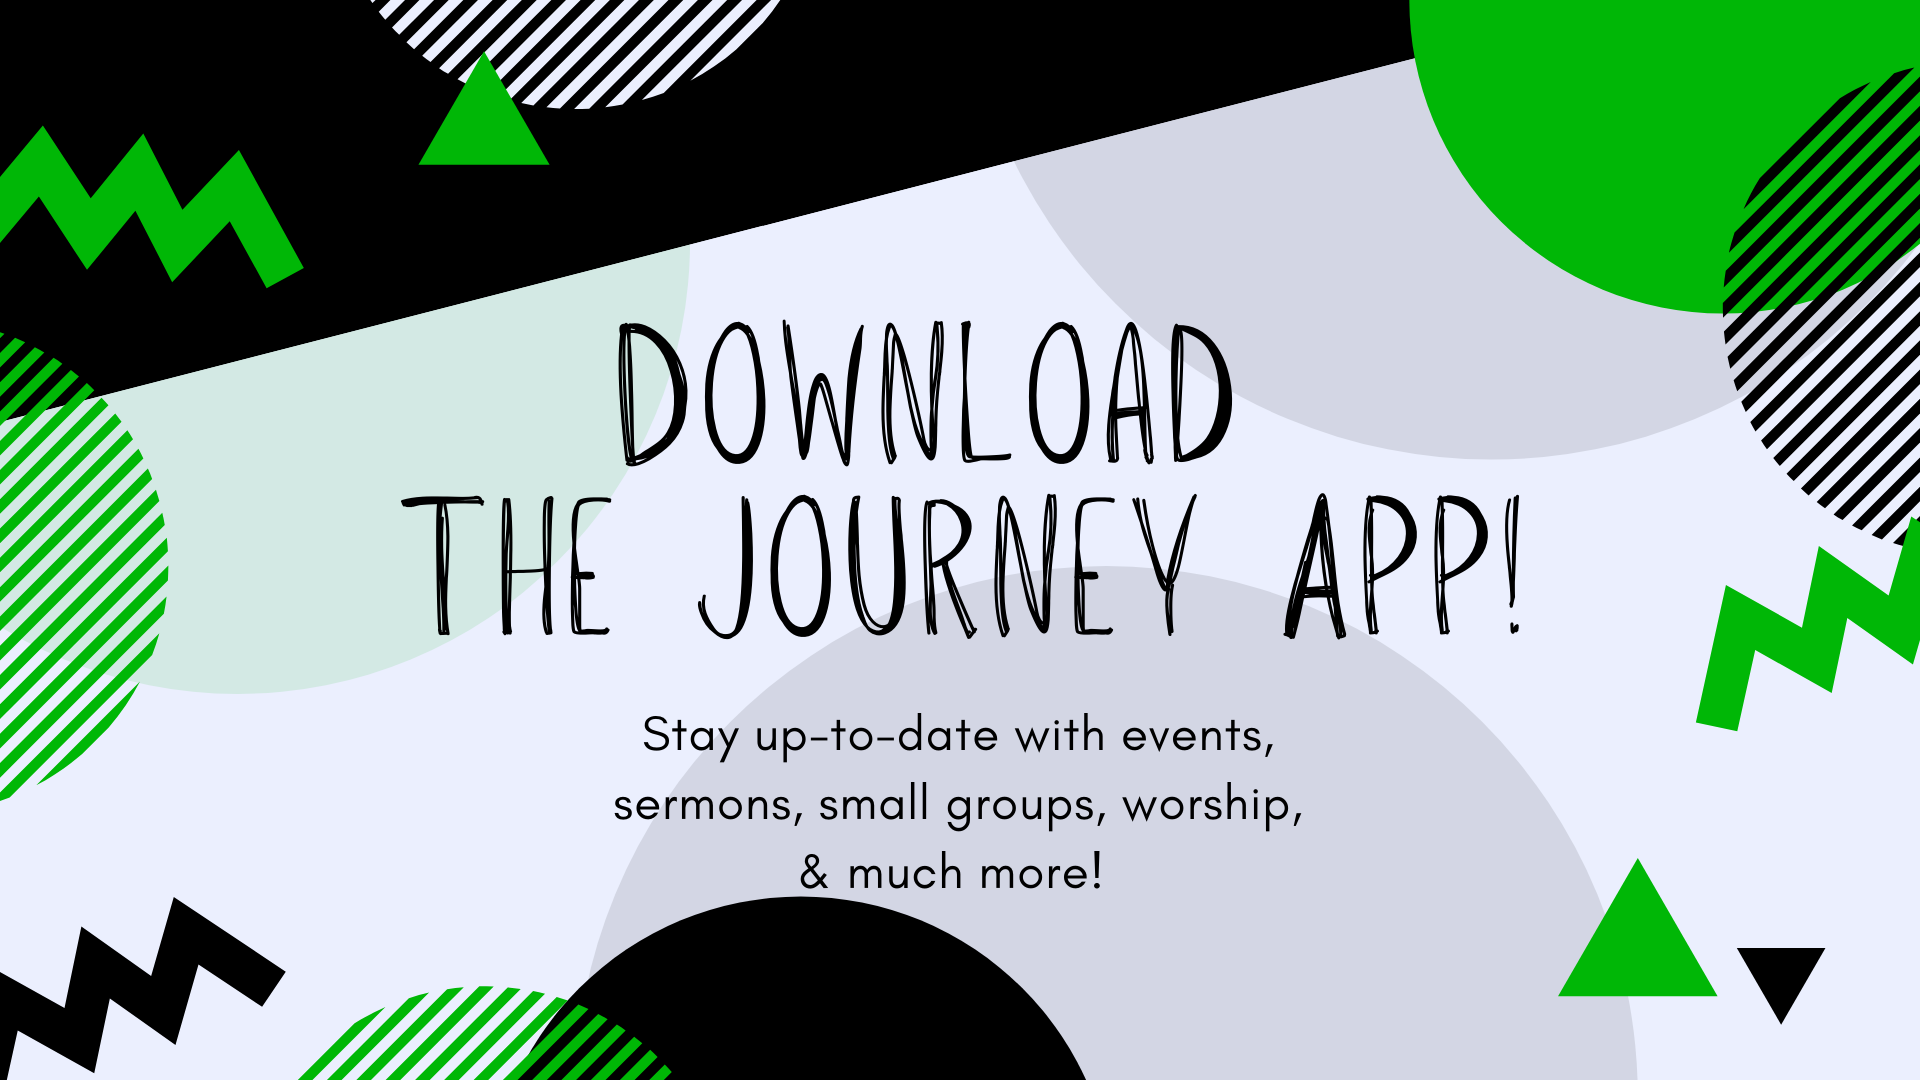 Download The Journey App!